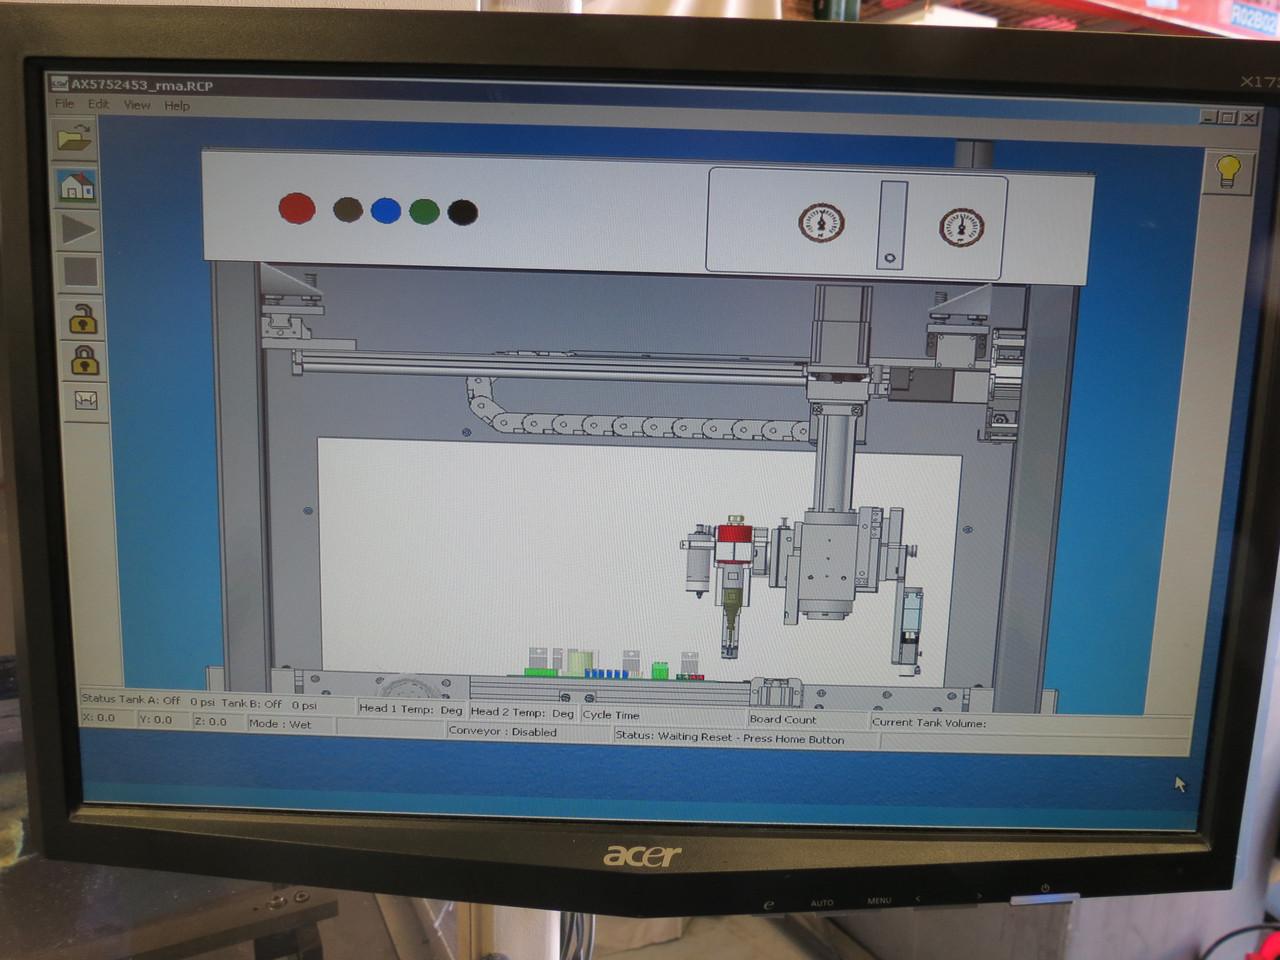 2009 USI Ultrasonic Systems Inc. Prism Ultra-Coat 300 Conformal Coating Machine